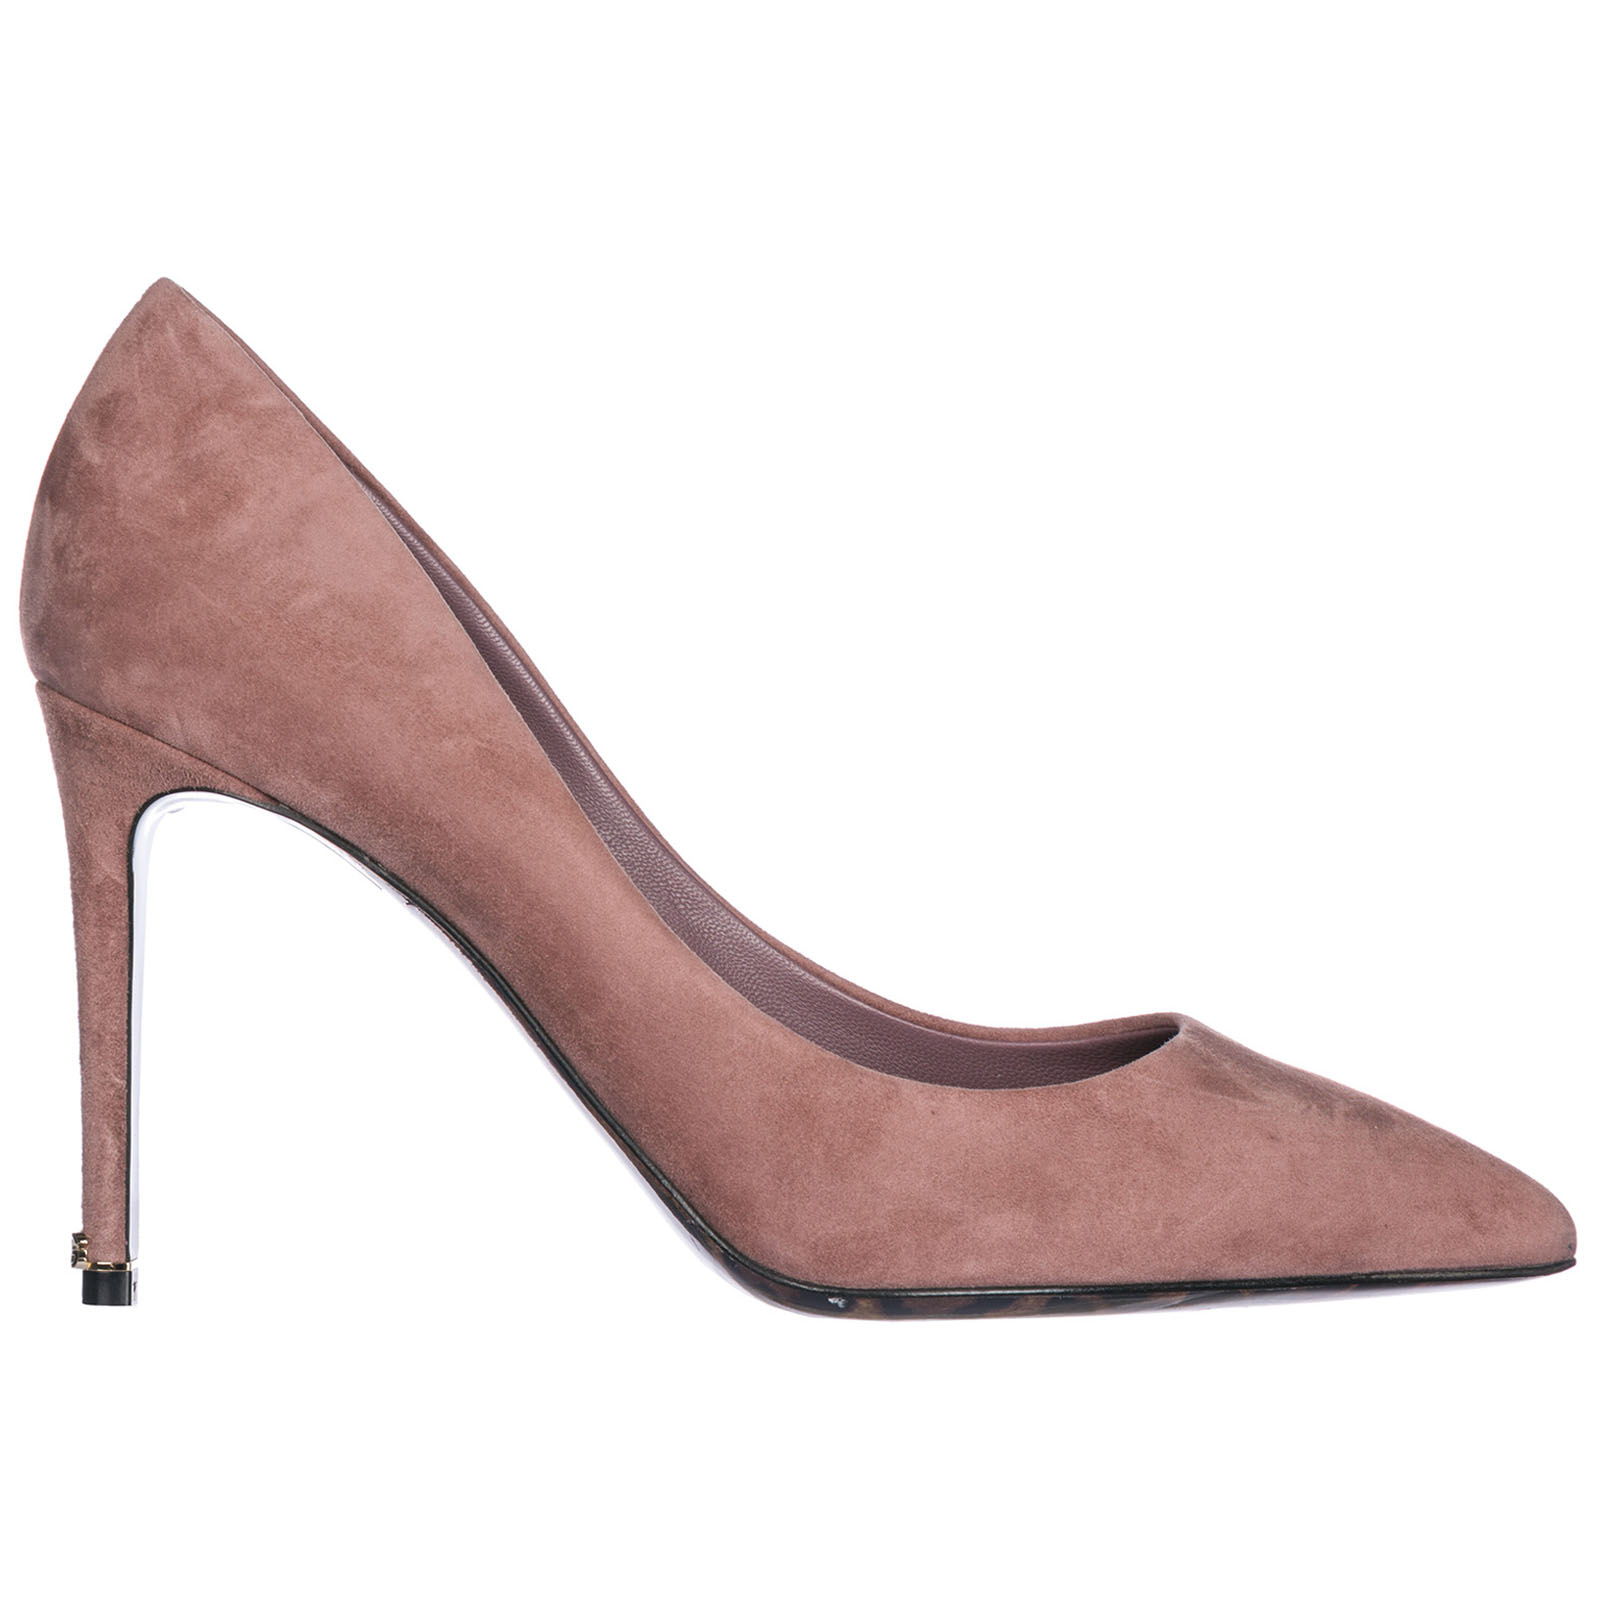 Decolletes decoltè scarpe donna con tacco camoscio kate